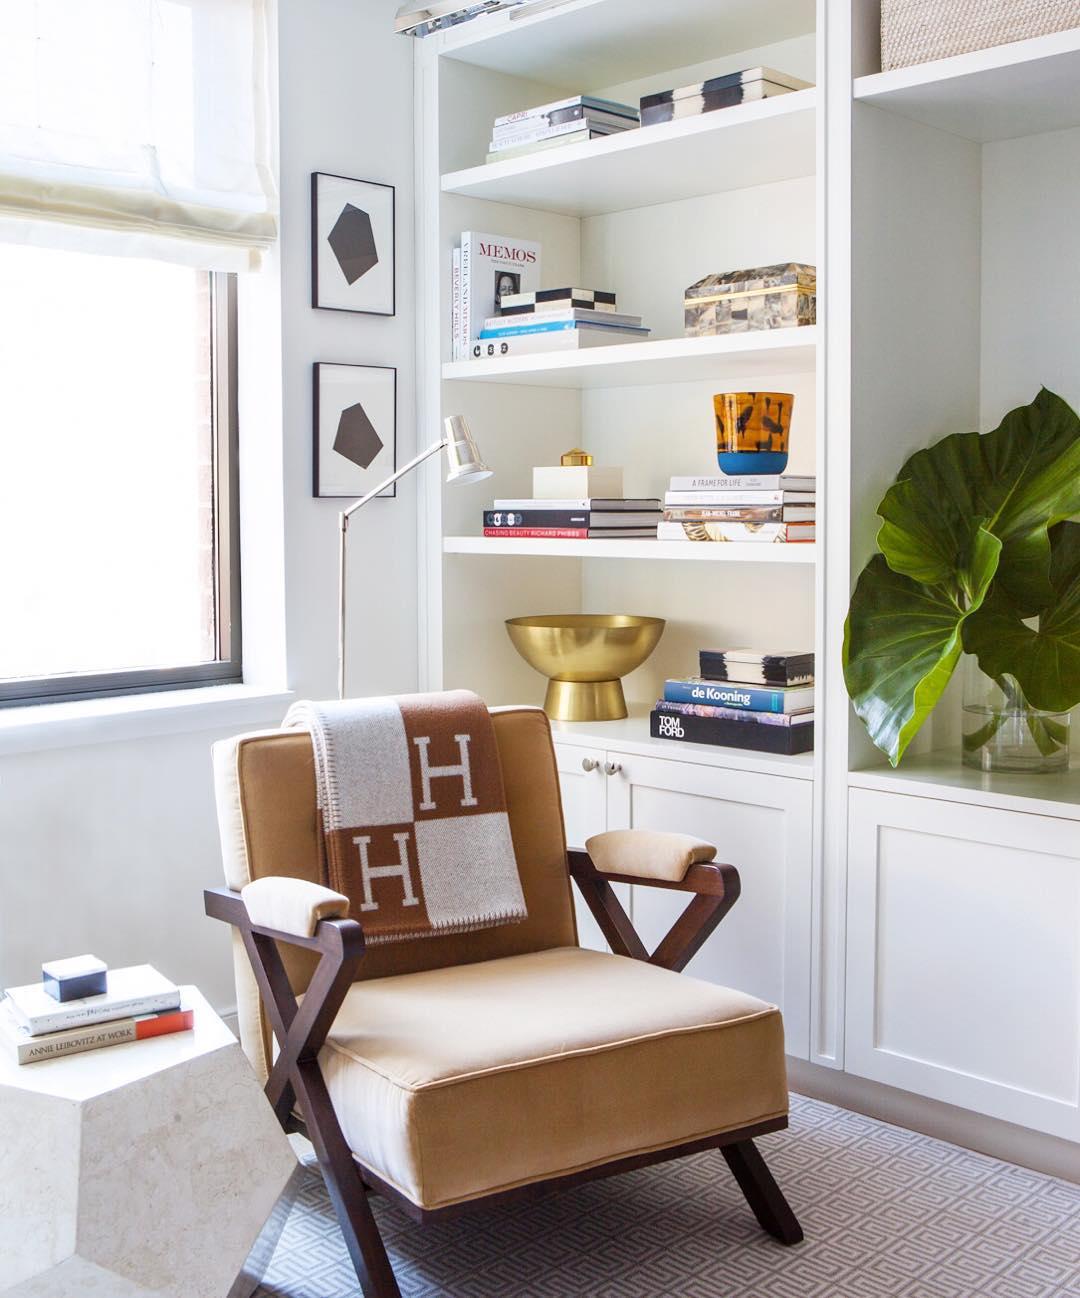 Cozy Winter Room Decor Instagram Pictures